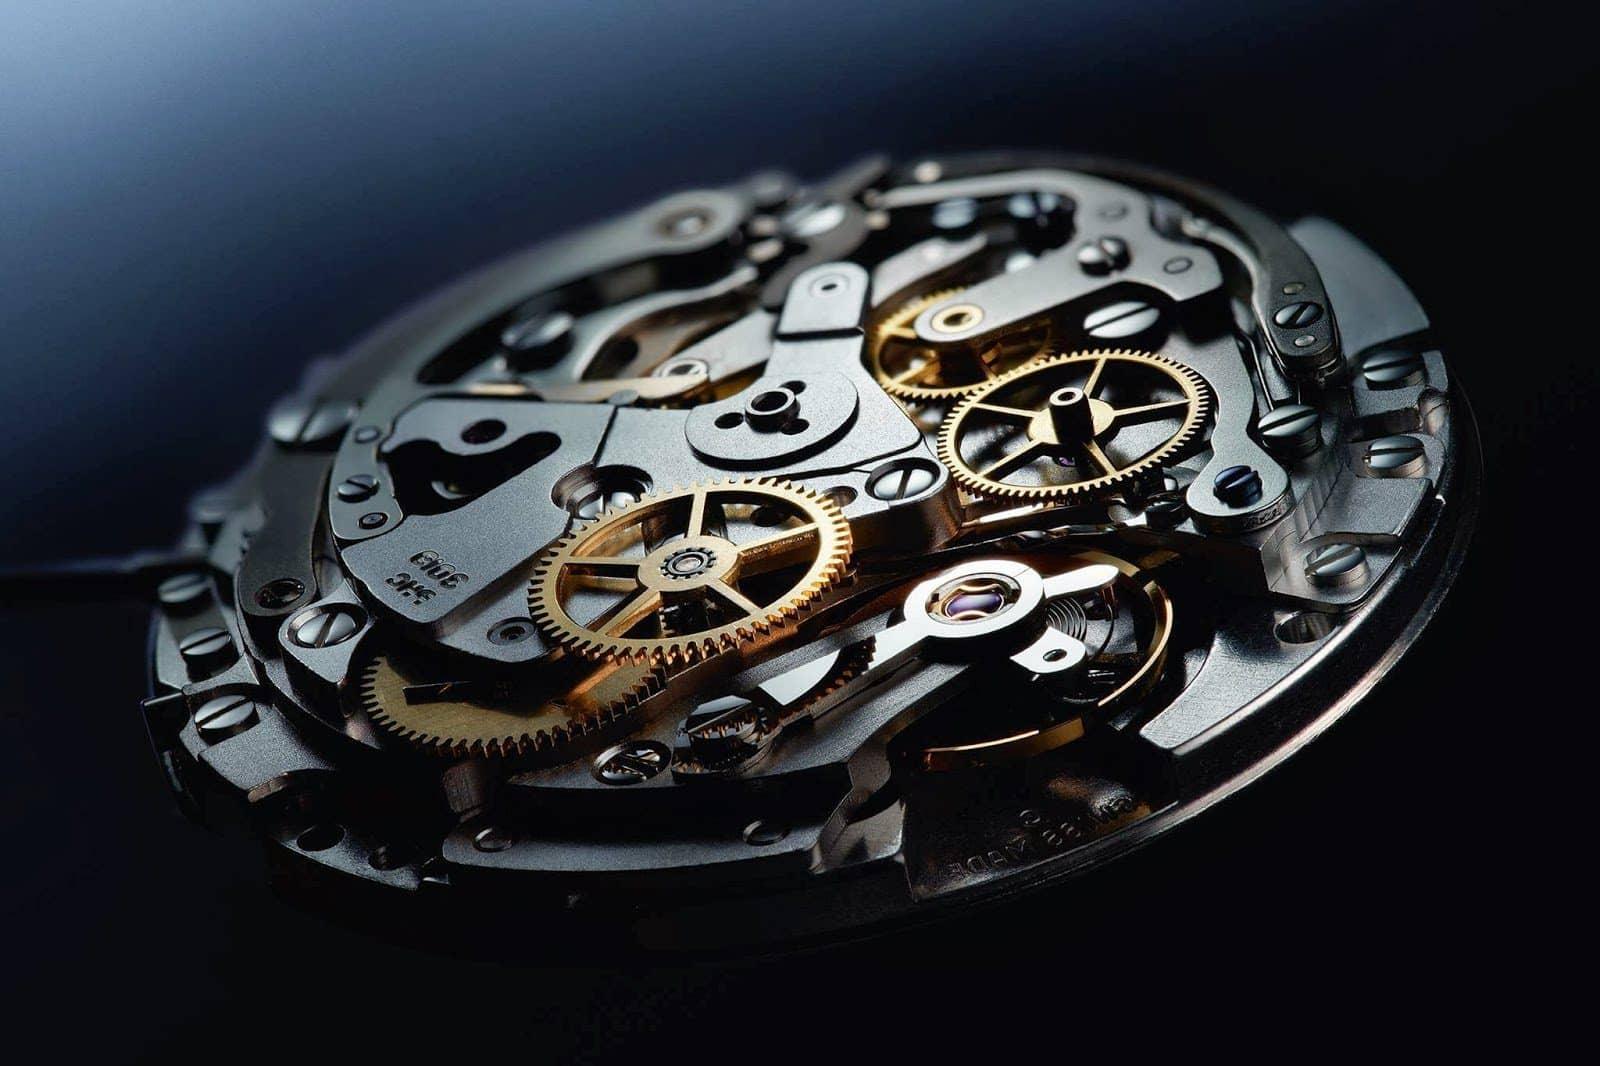 Servicio técnico de relojes